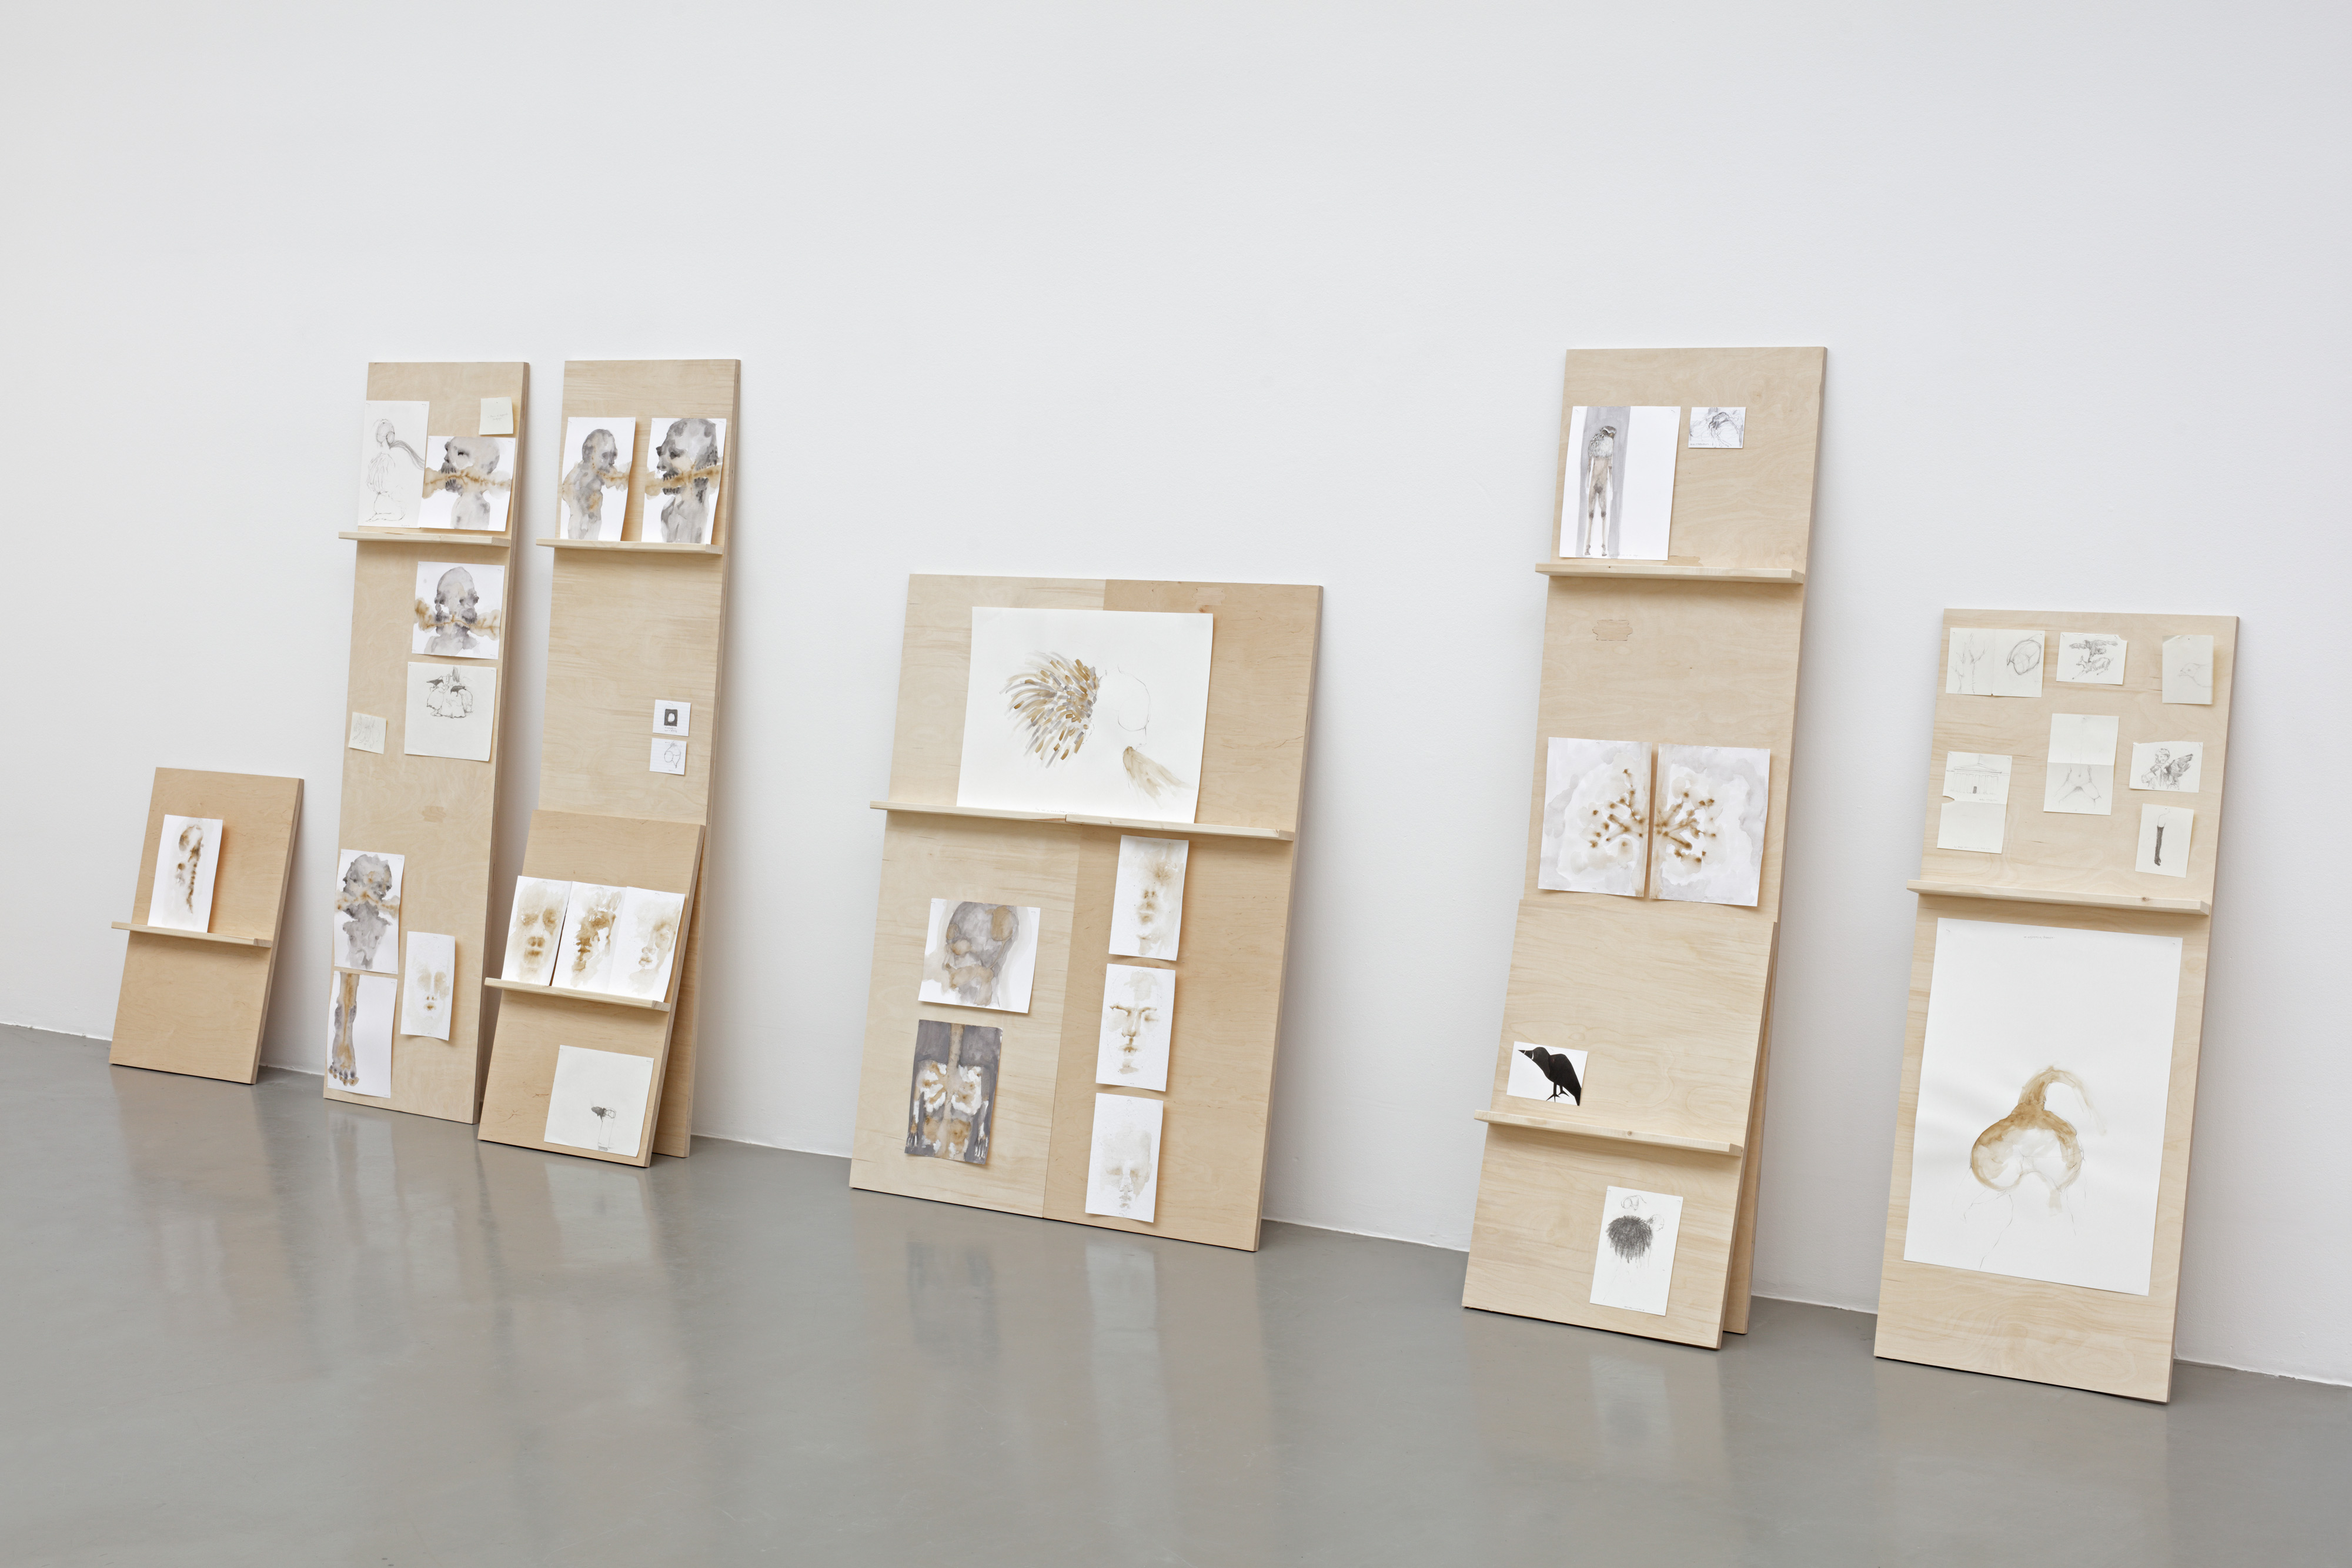 Galerie Barbara Thumm \ Maria José Arjona